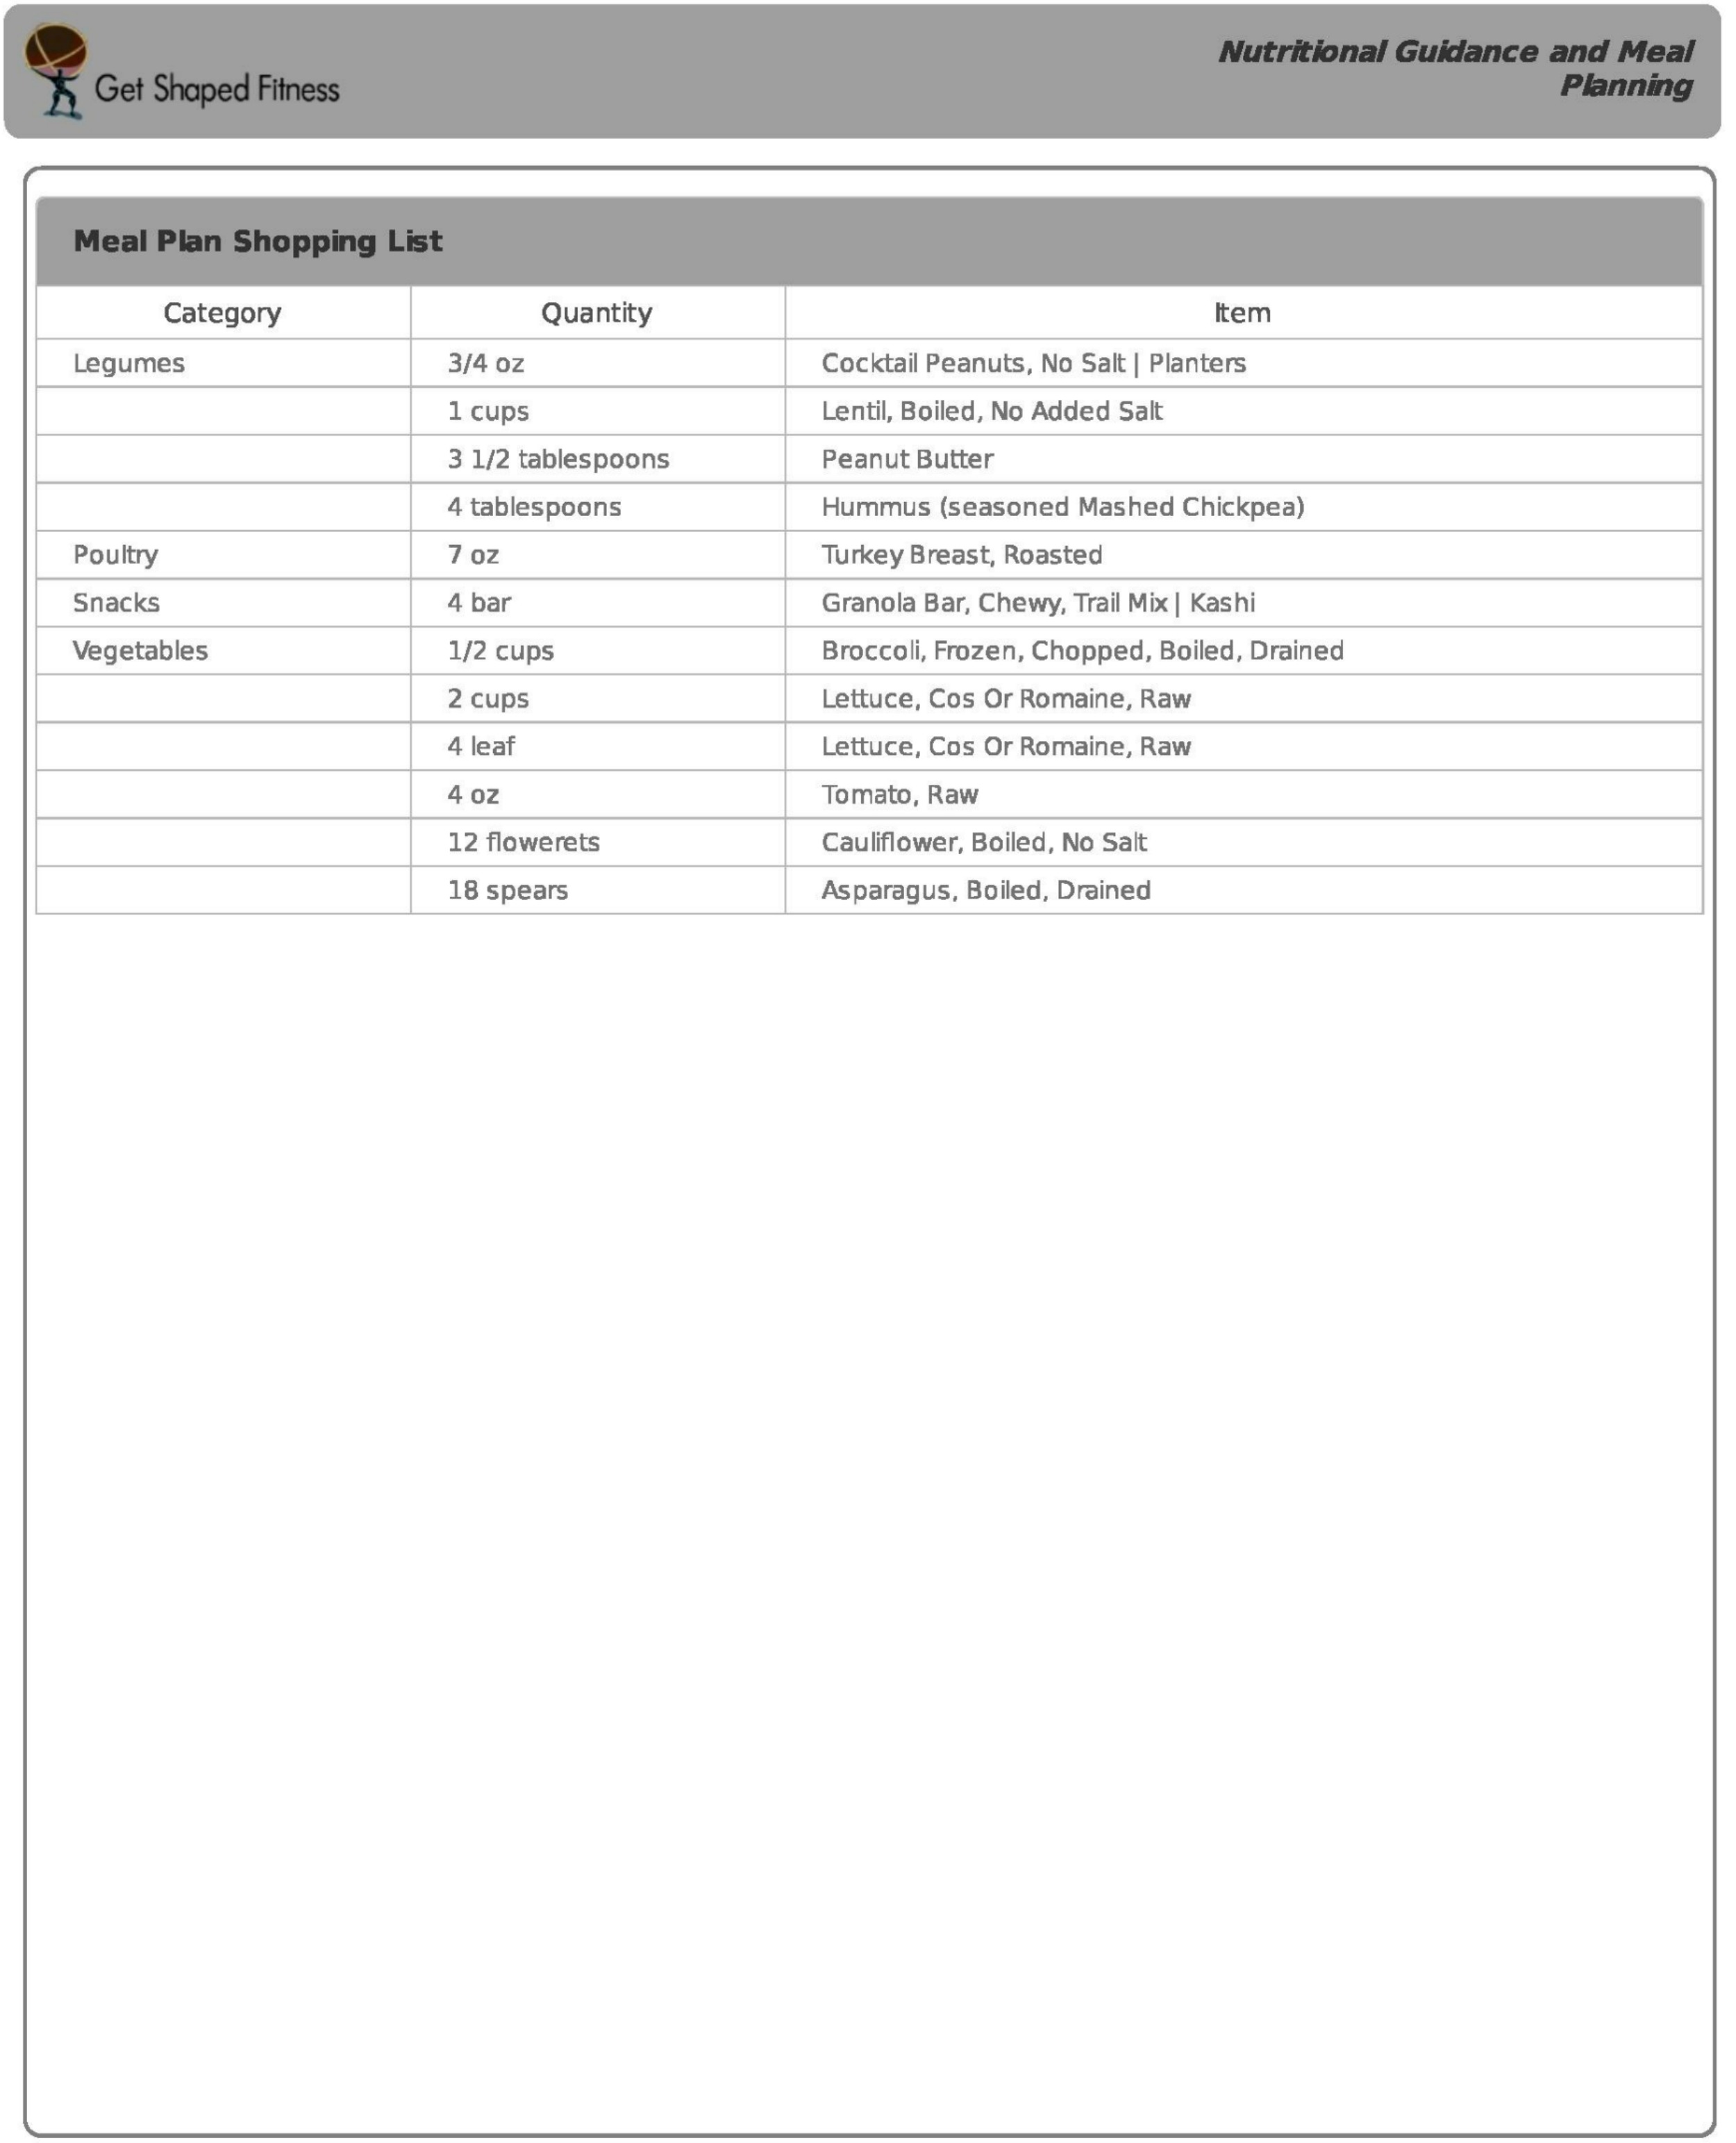 Sample MealPlan-page-011.jpg